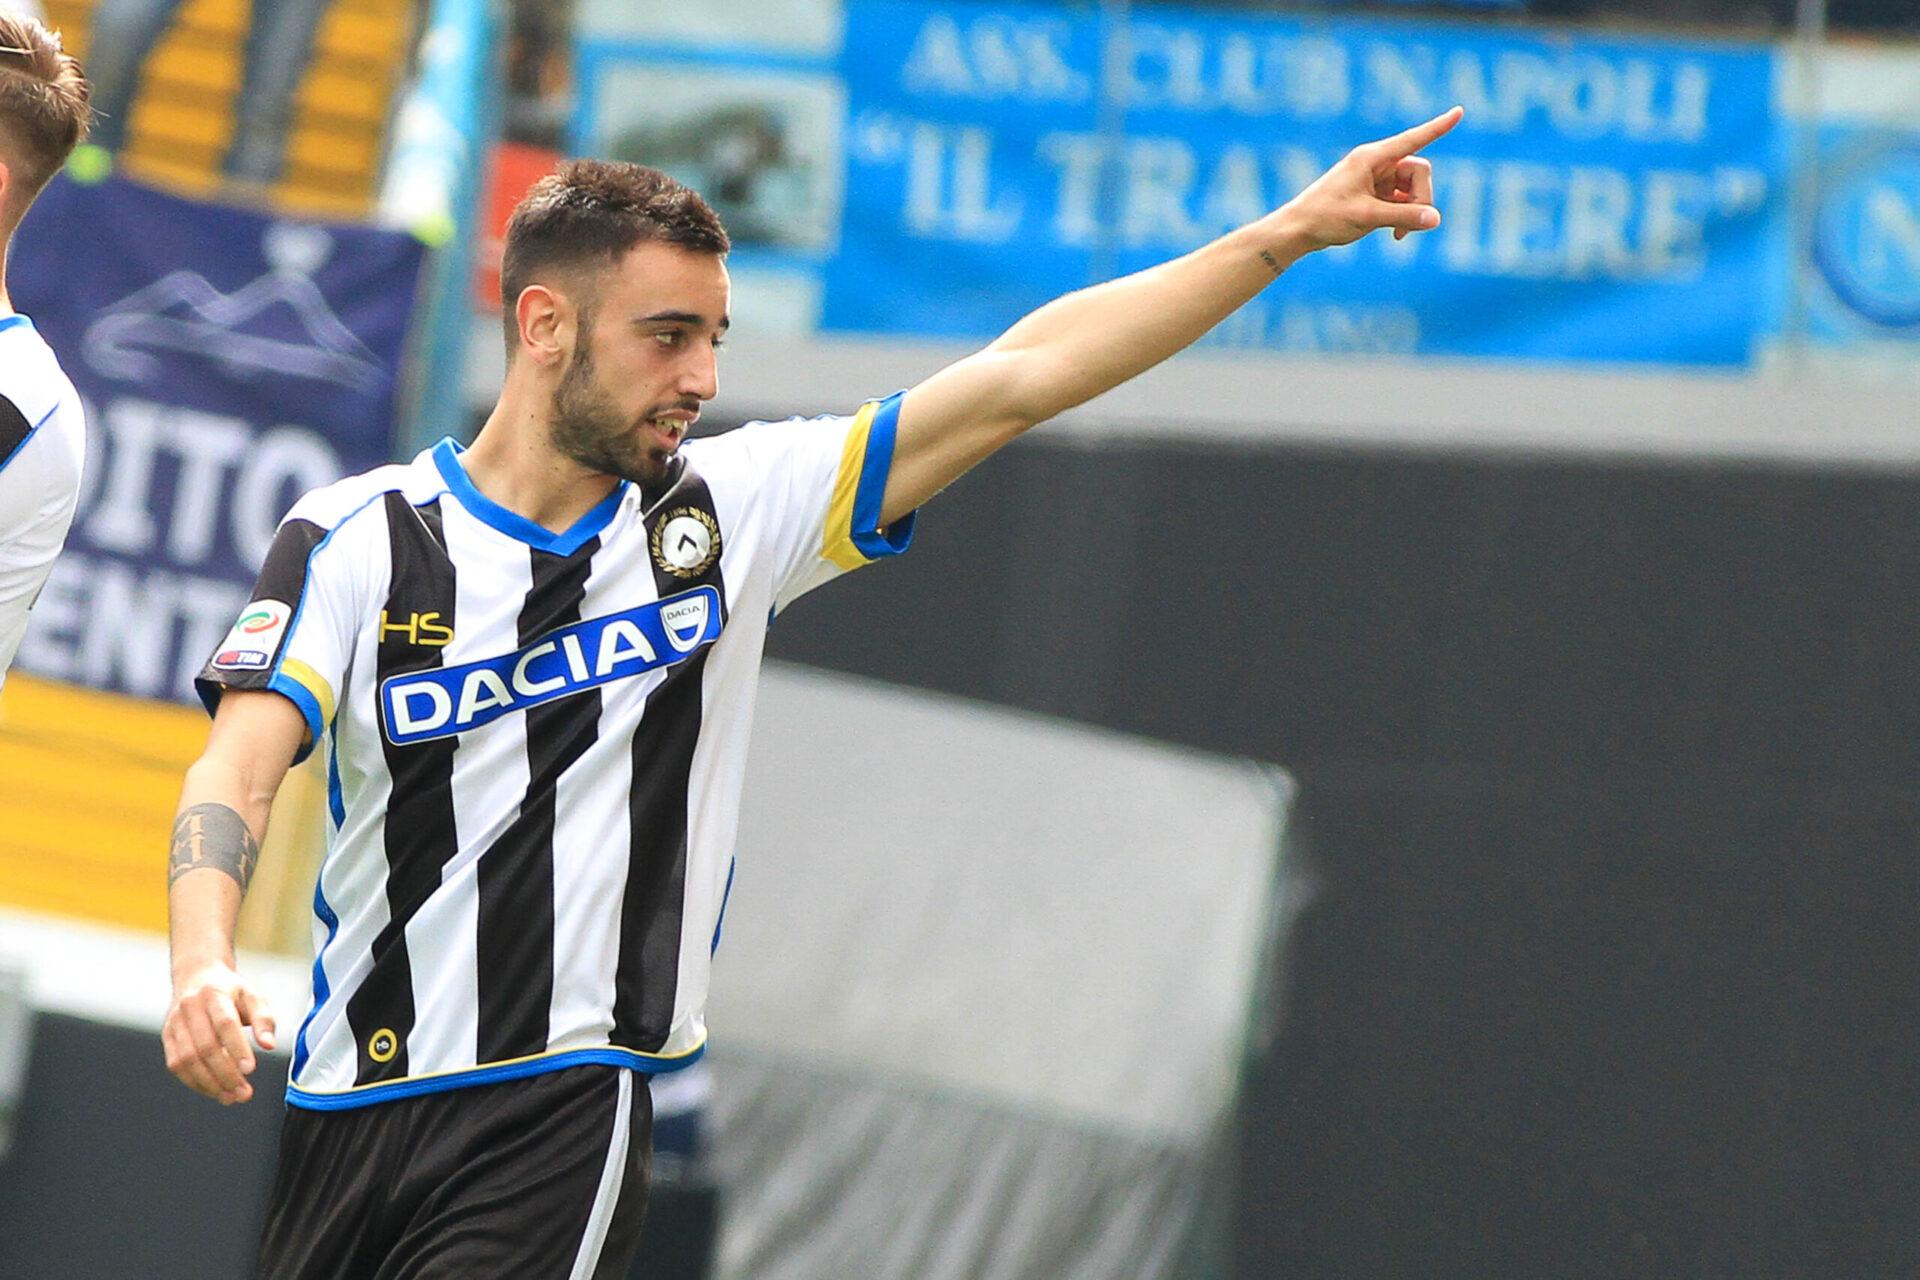 Bruno Fernandes jouant avec l'Udinese Calcio (Icon Sport)